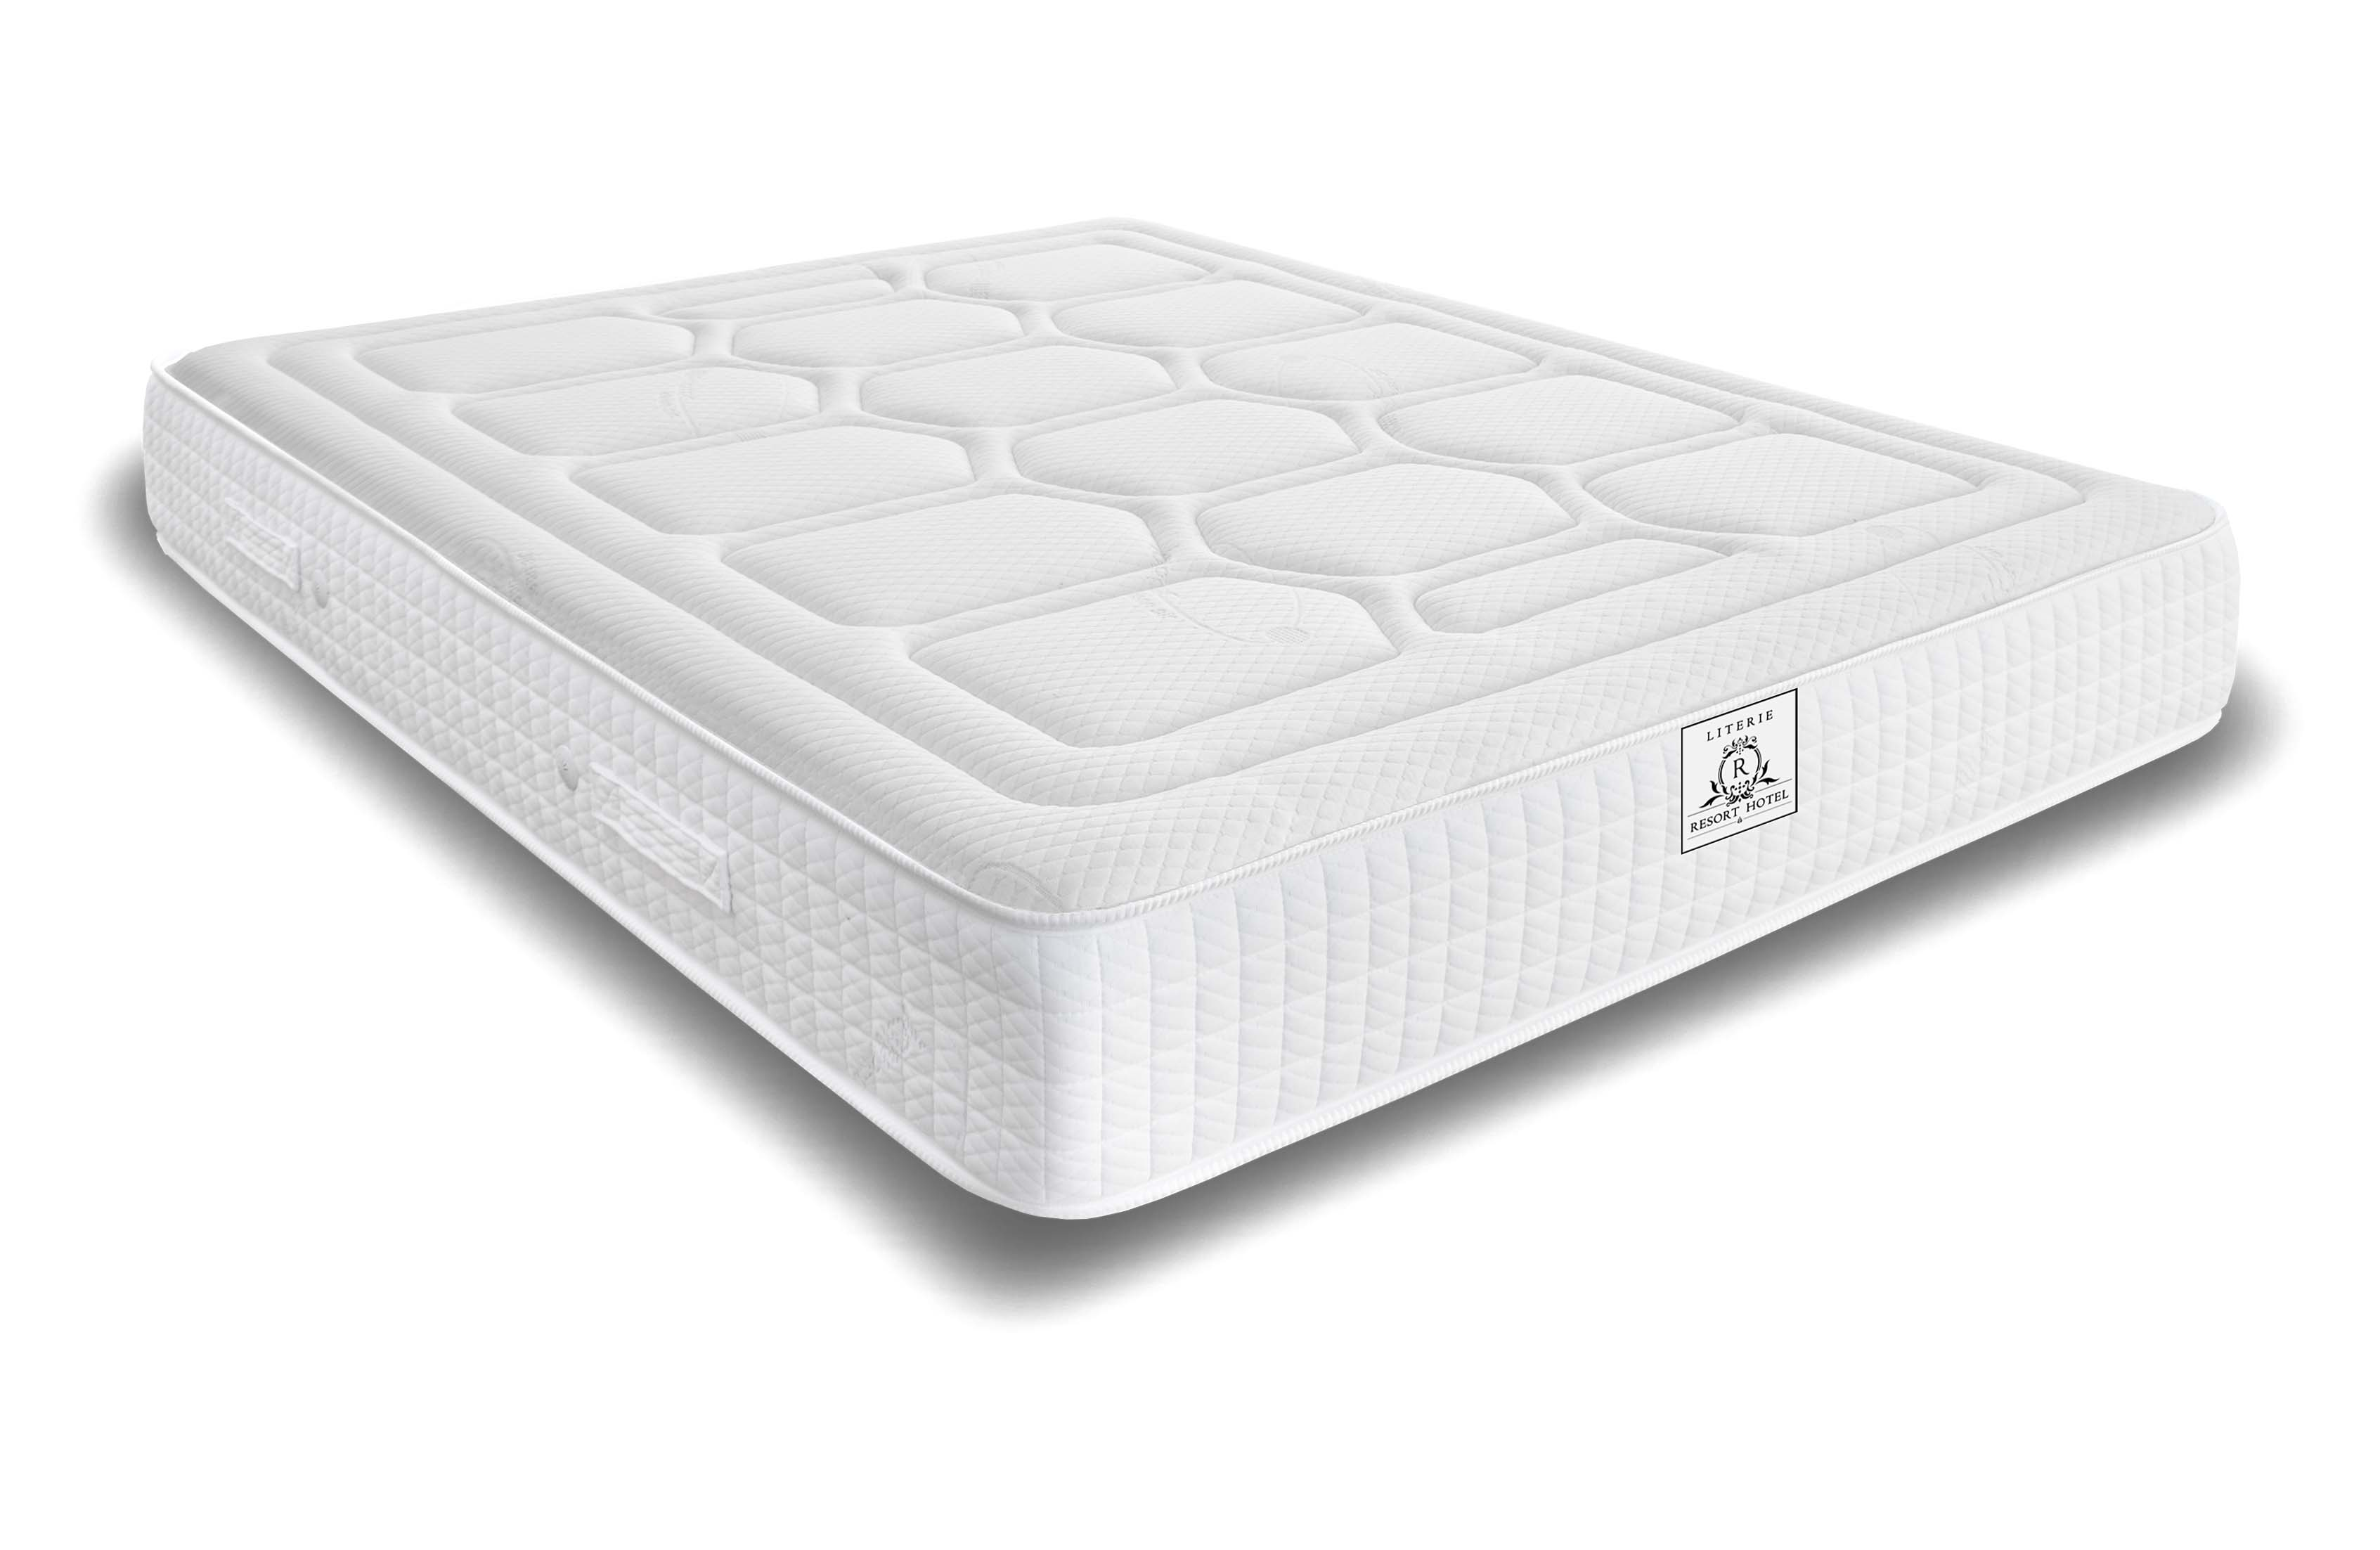 matelas 140x200 ressorts ensachs affordable irisette. Black Bedroom Furniture Sets. Home Design Ideas